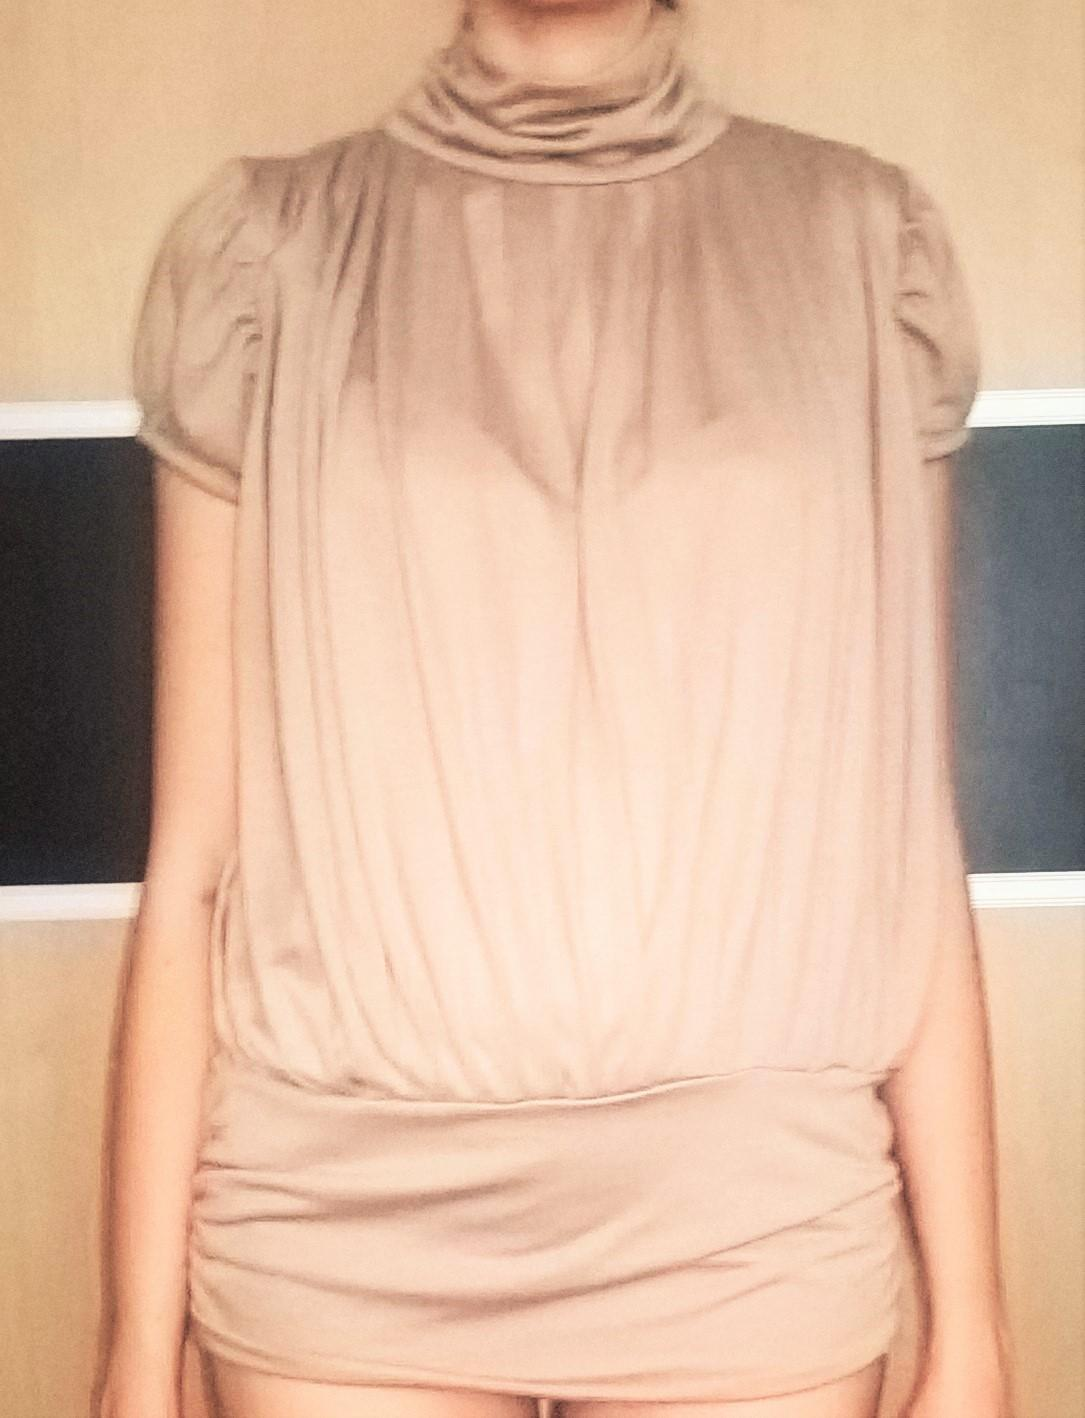 elegantná krémová blúzka / top č. 36 - 38  - Obrázok č. 3